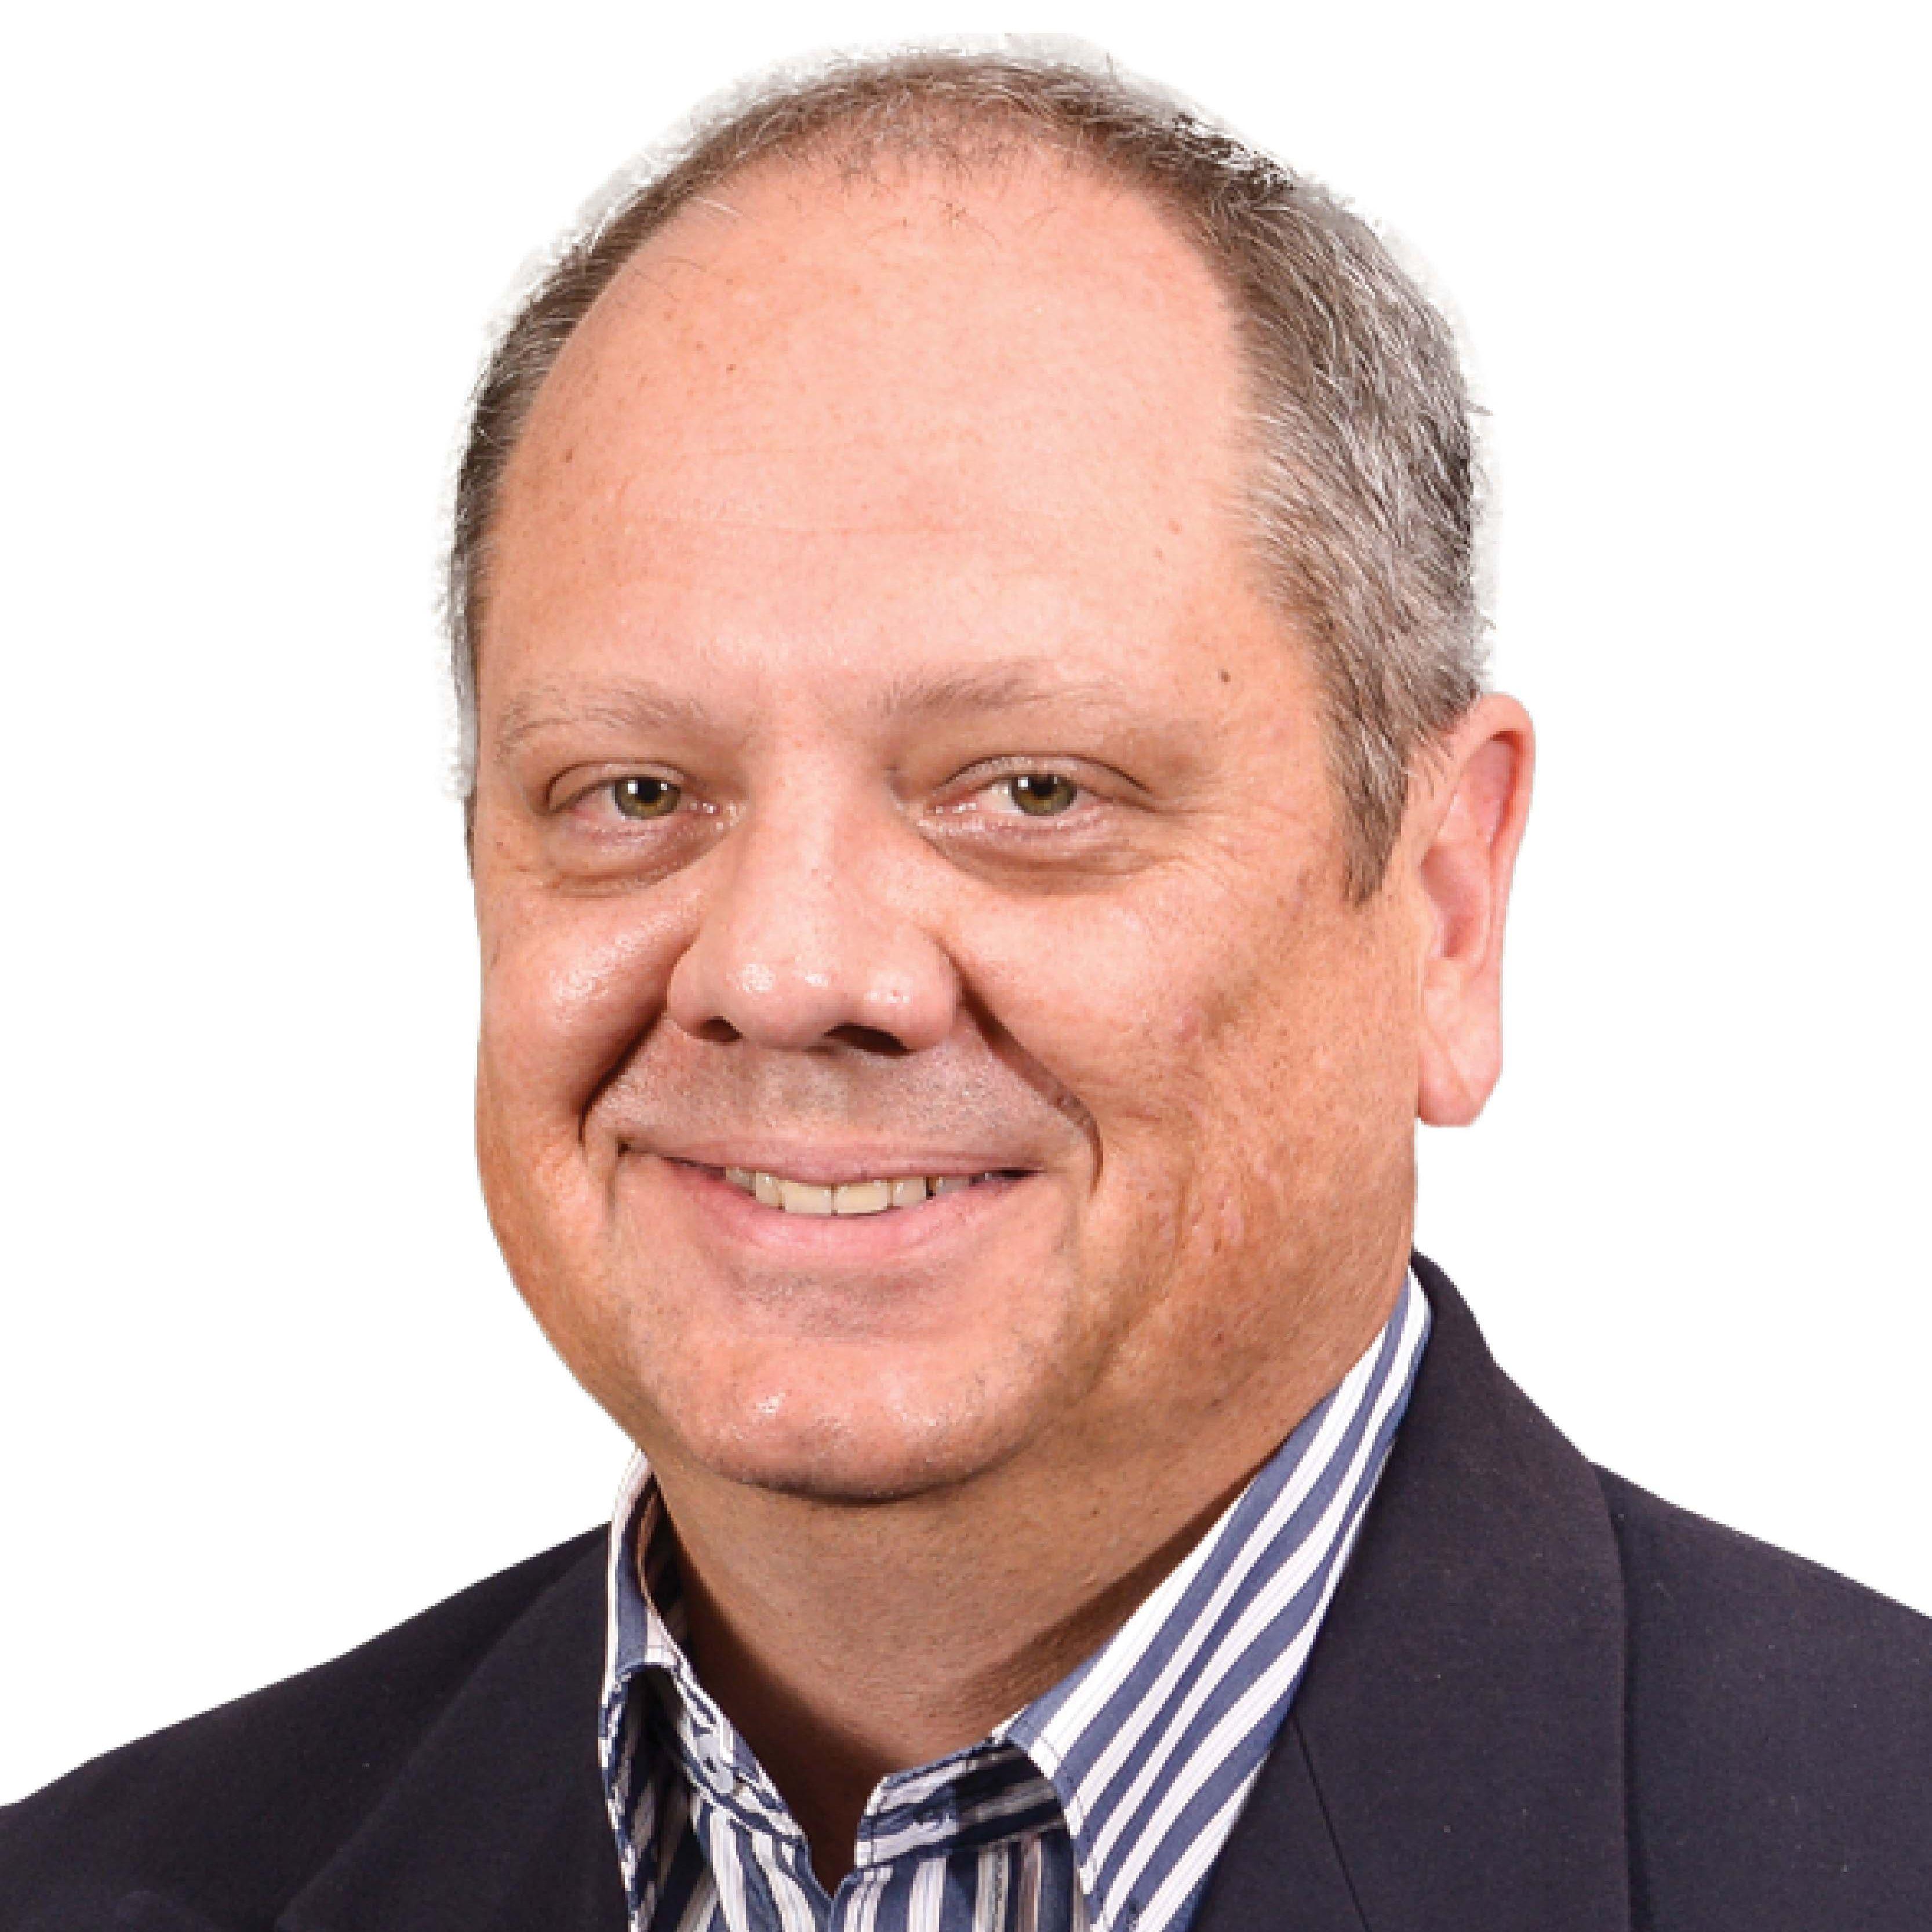 Profile photo of Evert Potgieter, Director: Risk Management at Astral Foods